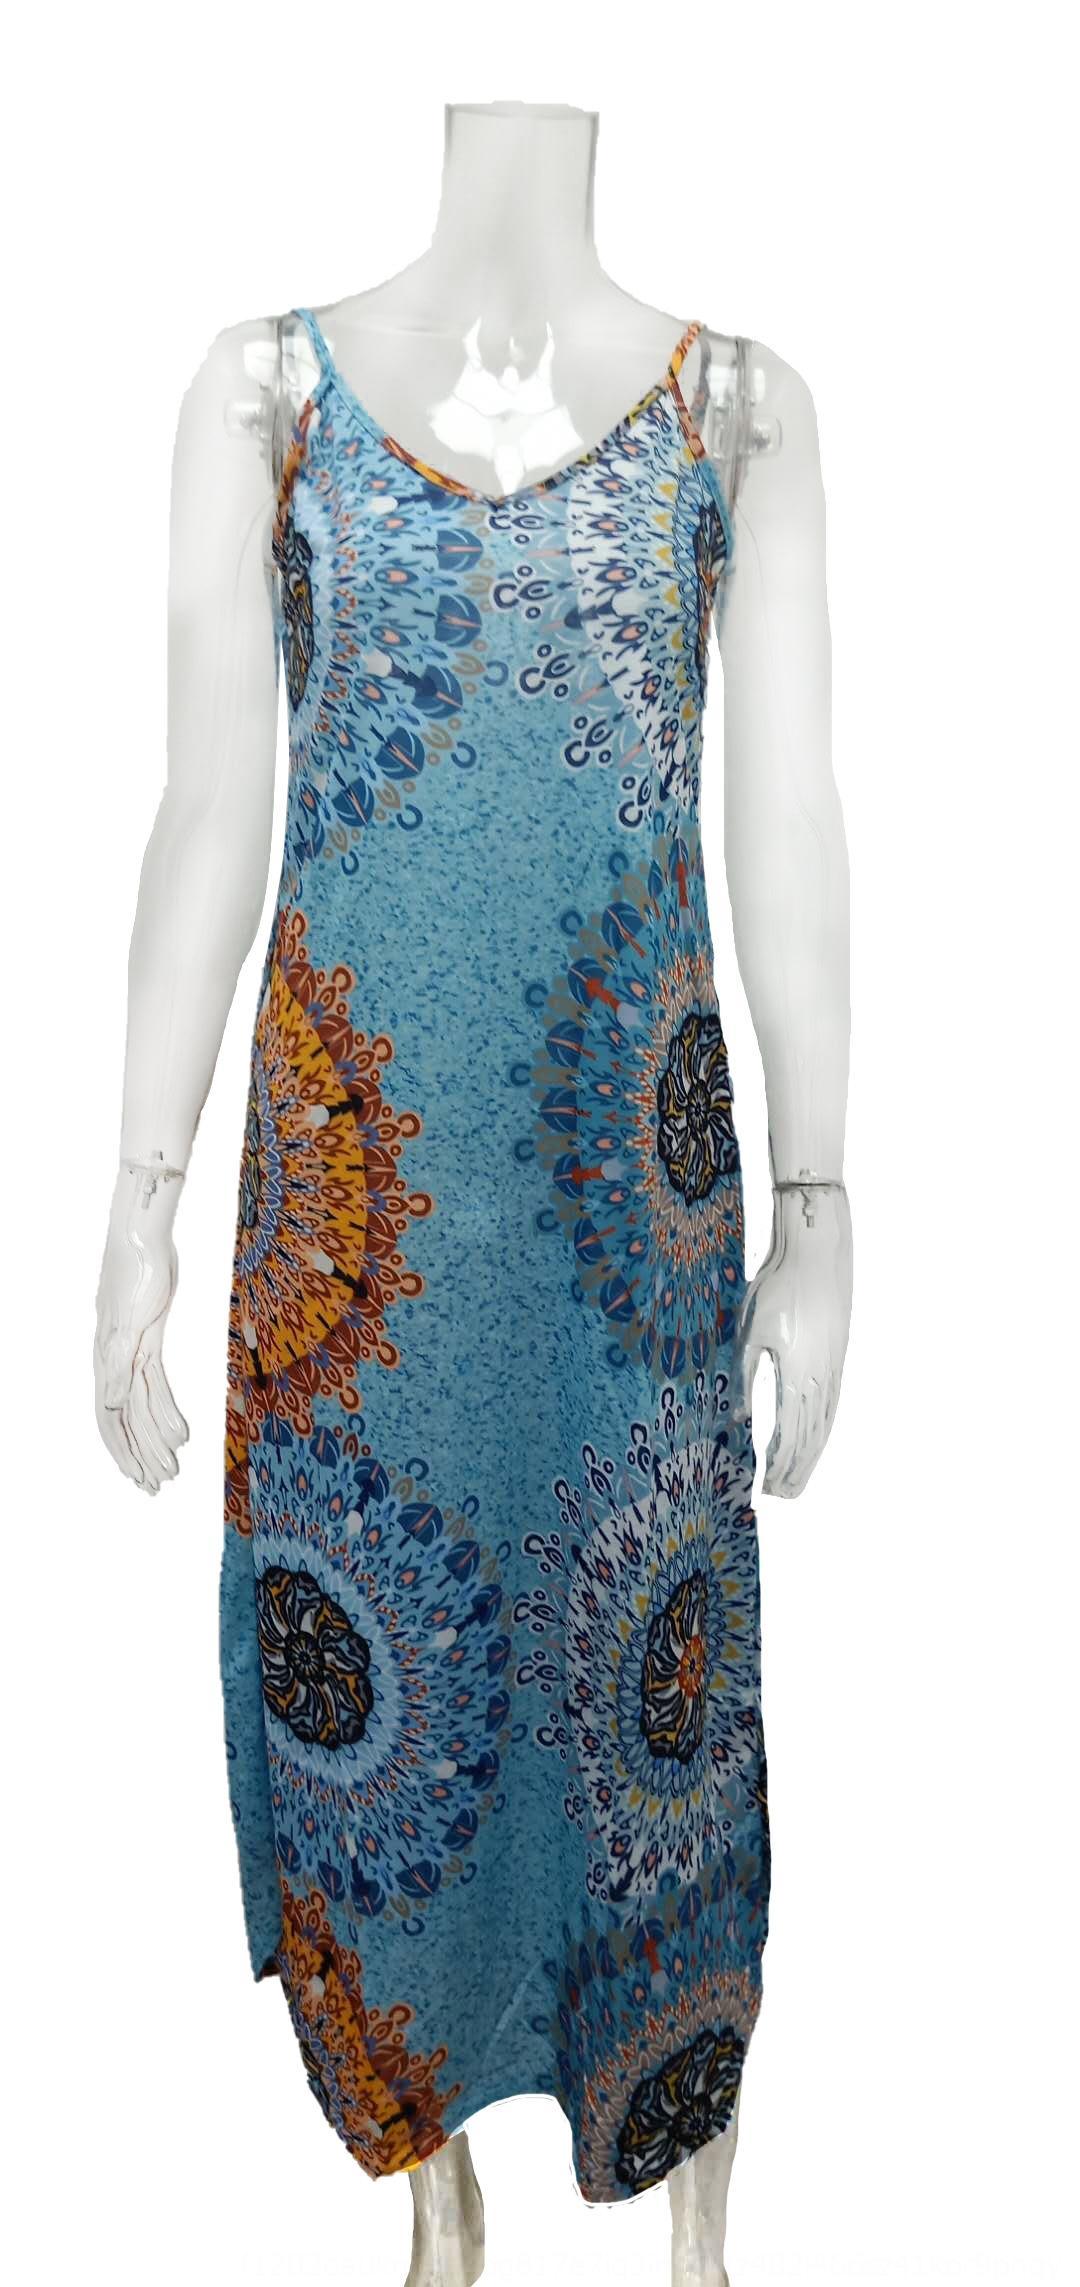 CTqYO ()2020 hot-selling women's Sling printed suspender large swing dress ()2020 hot-selling women's big big skirt Sling skirt printed susp